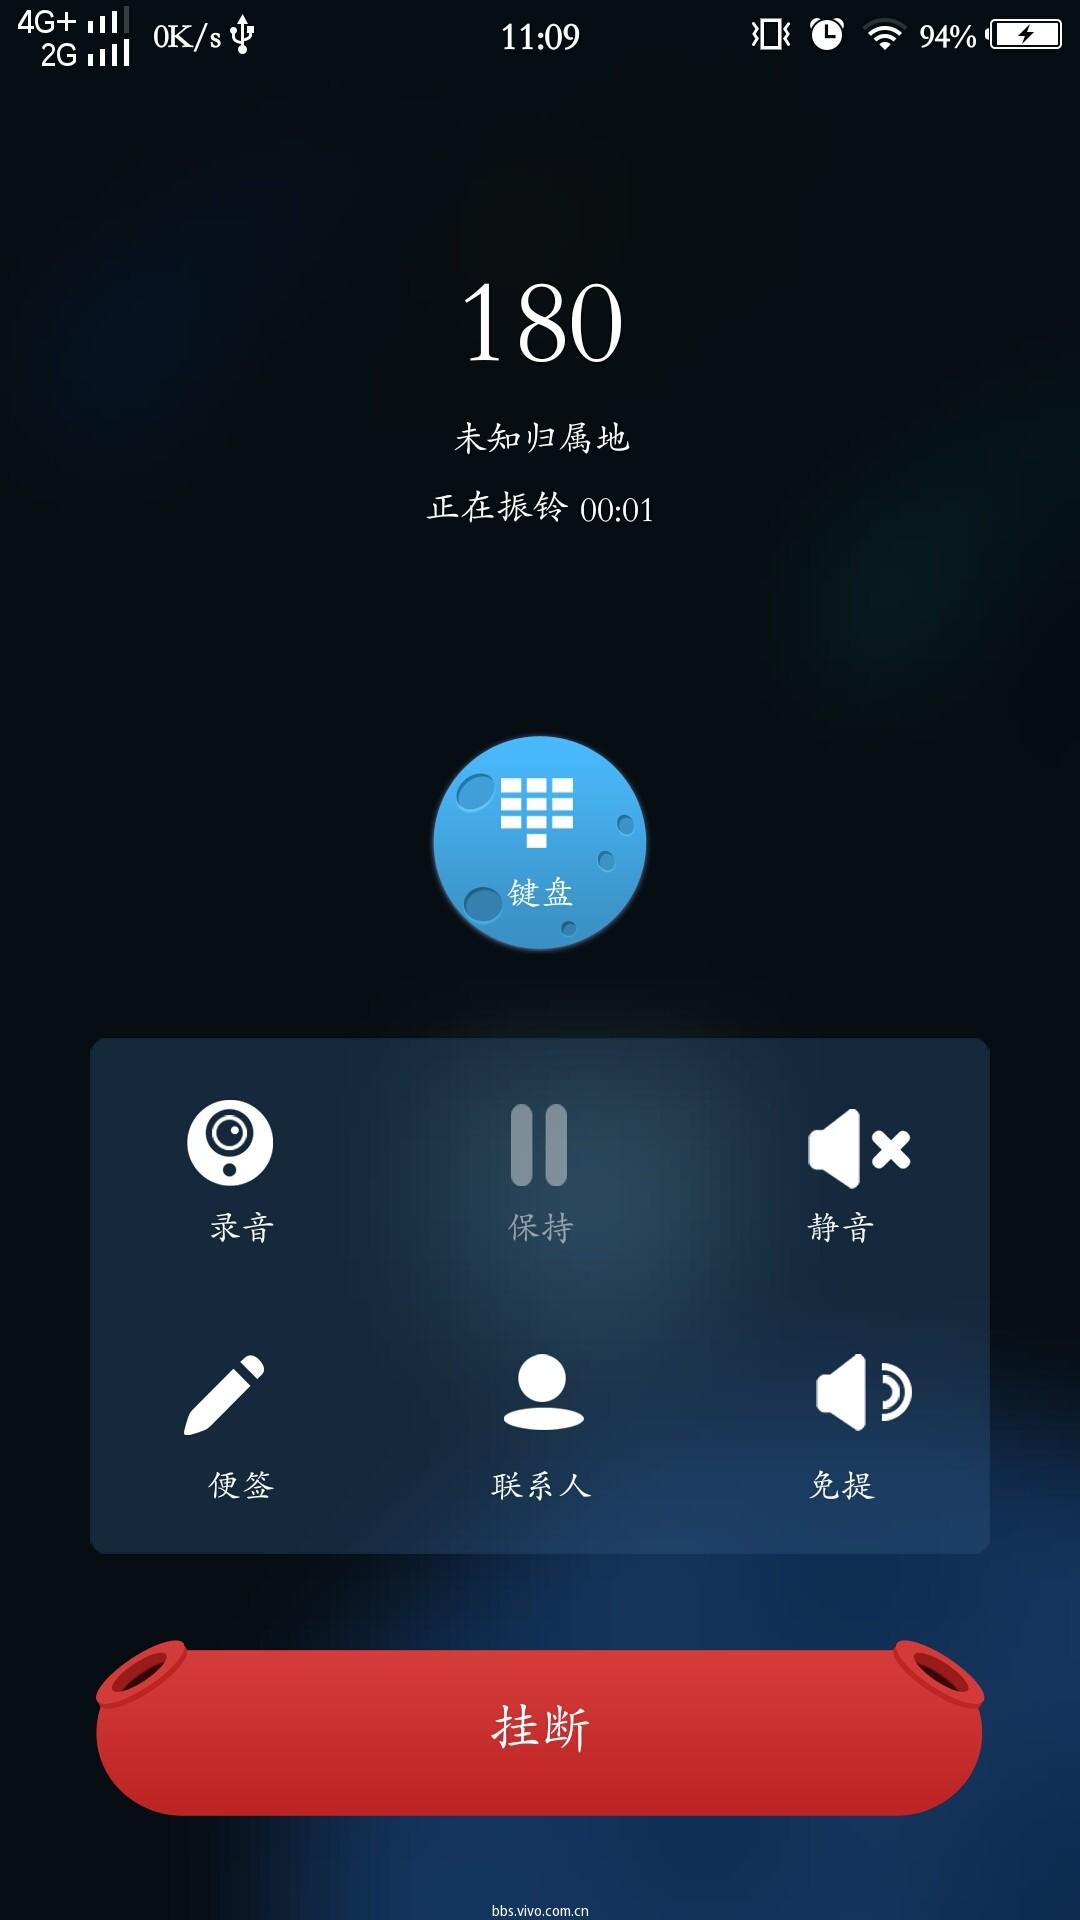 x7手机接电话界面挂断按钮太长,不好看